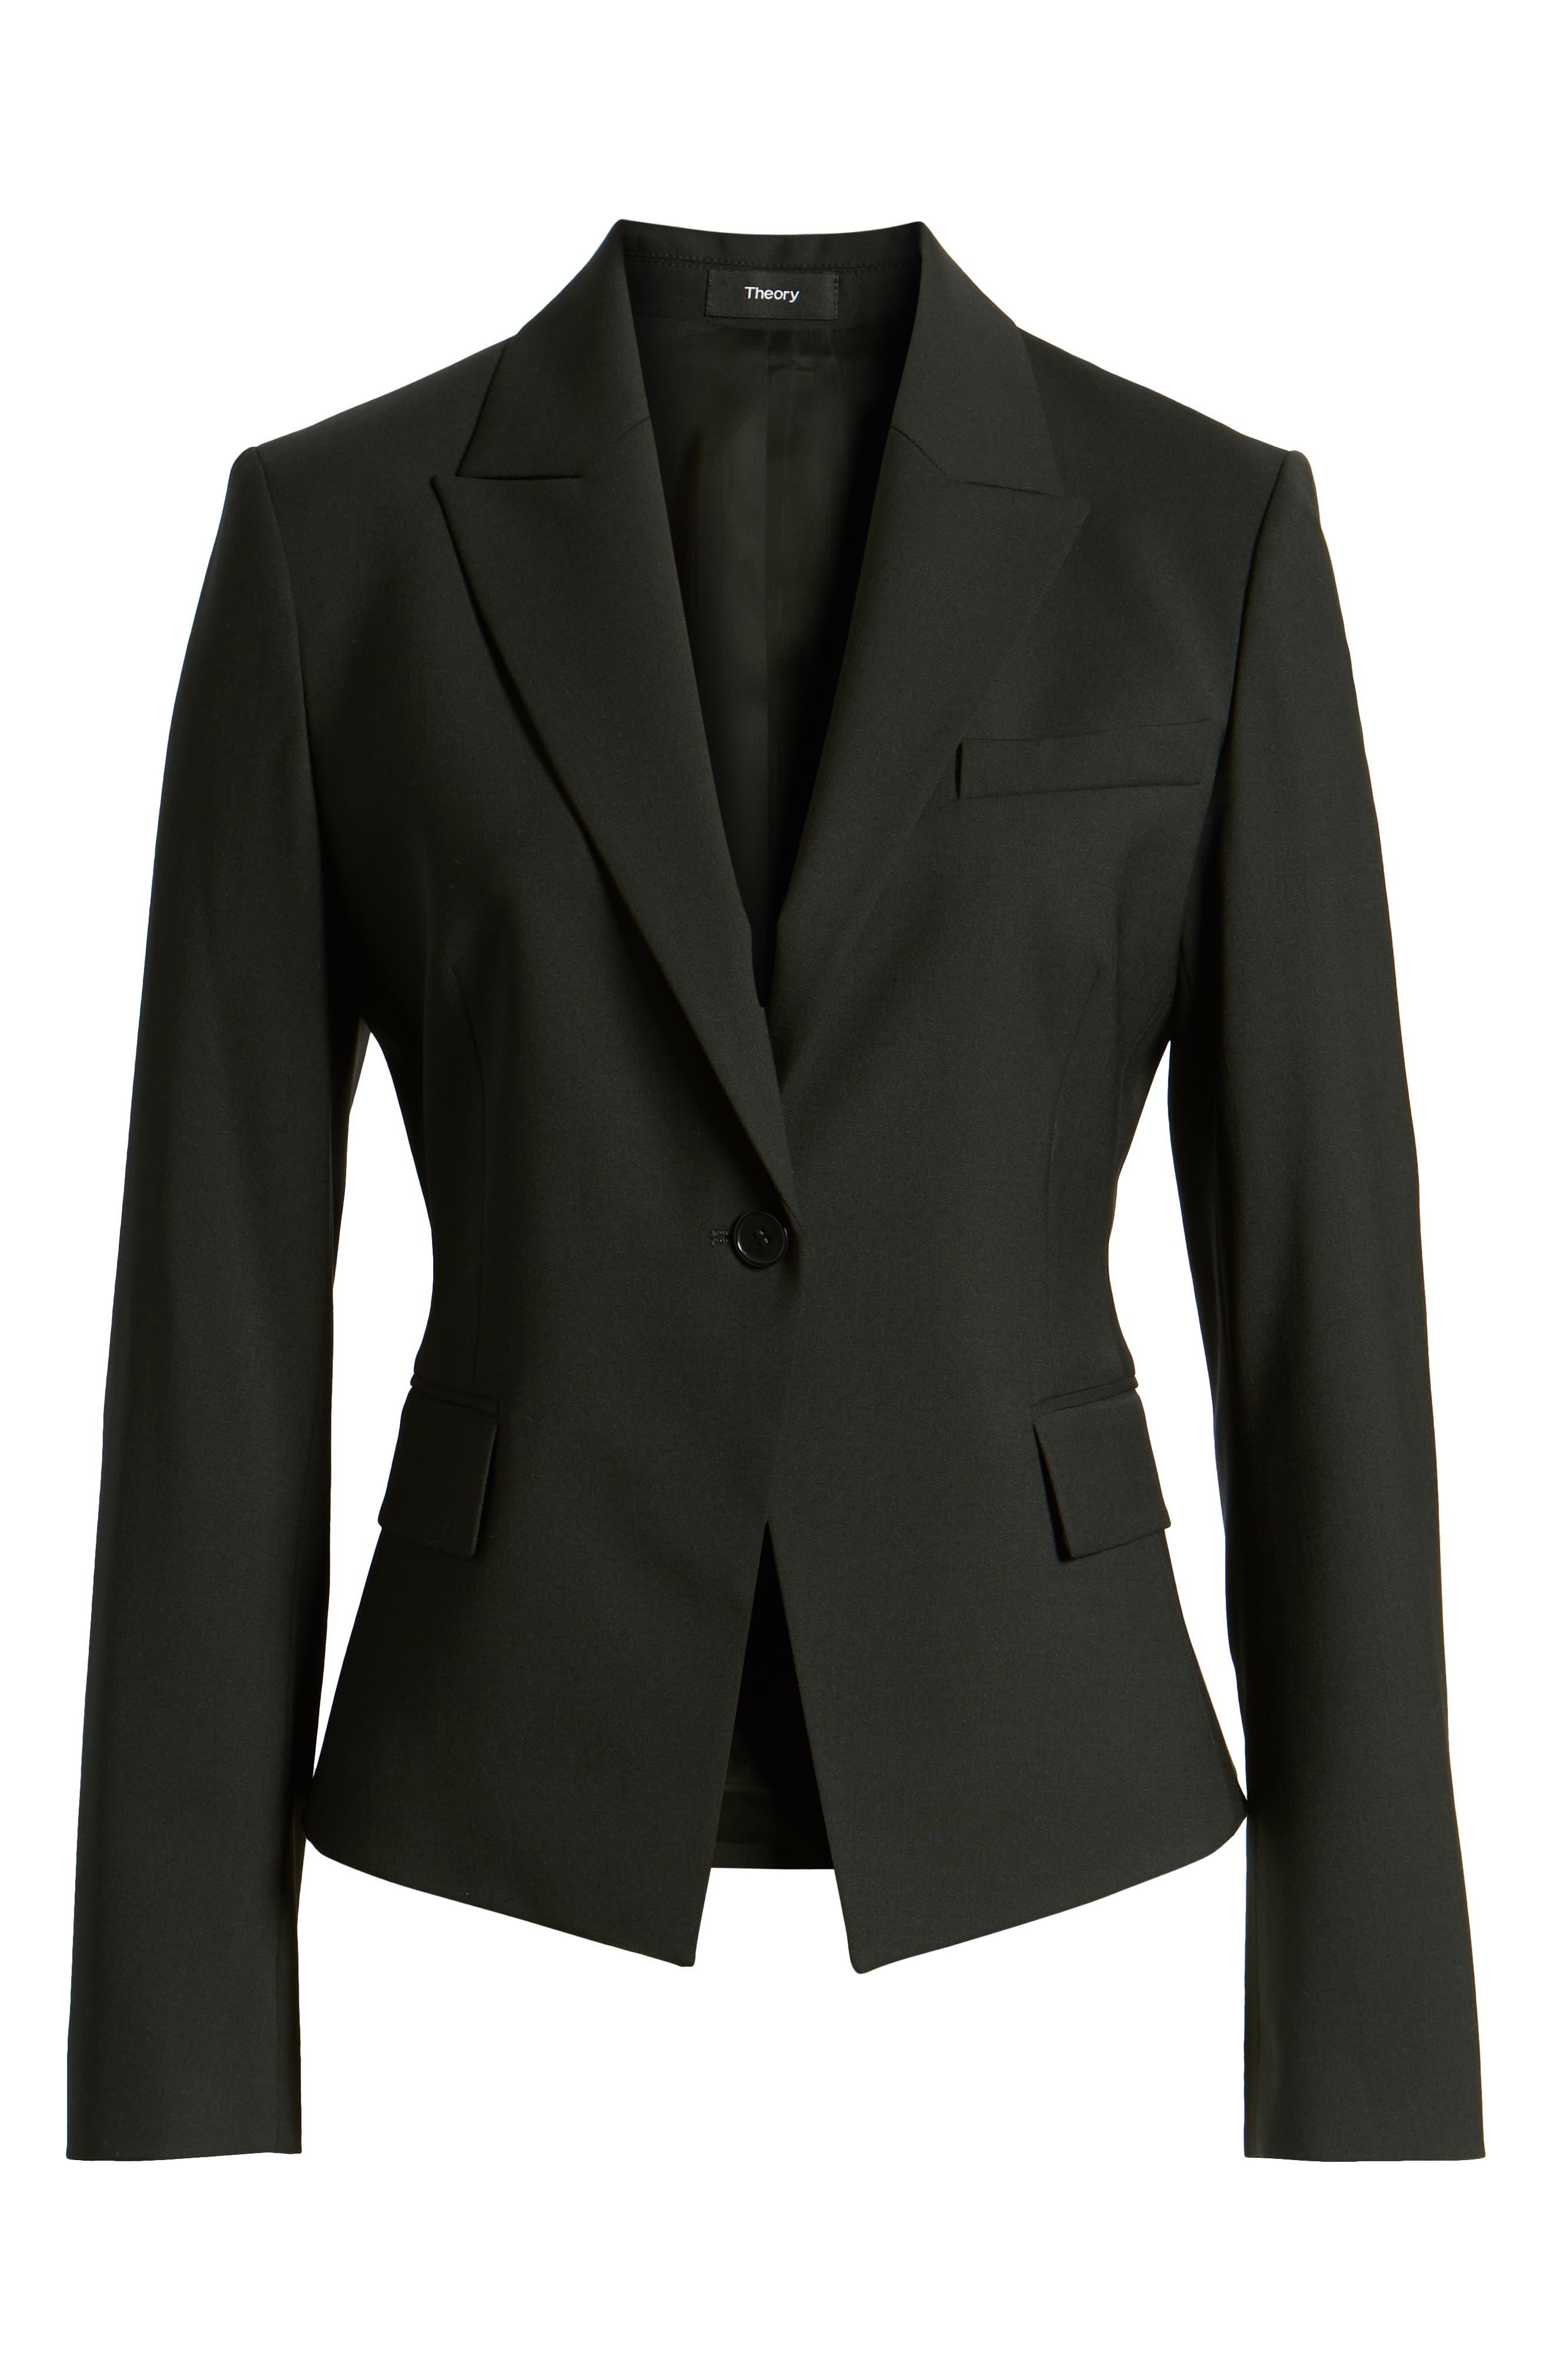 THEORY, Brince B Good Wool Suit Jacket, Alternate thumbnail 6, color, BLACK